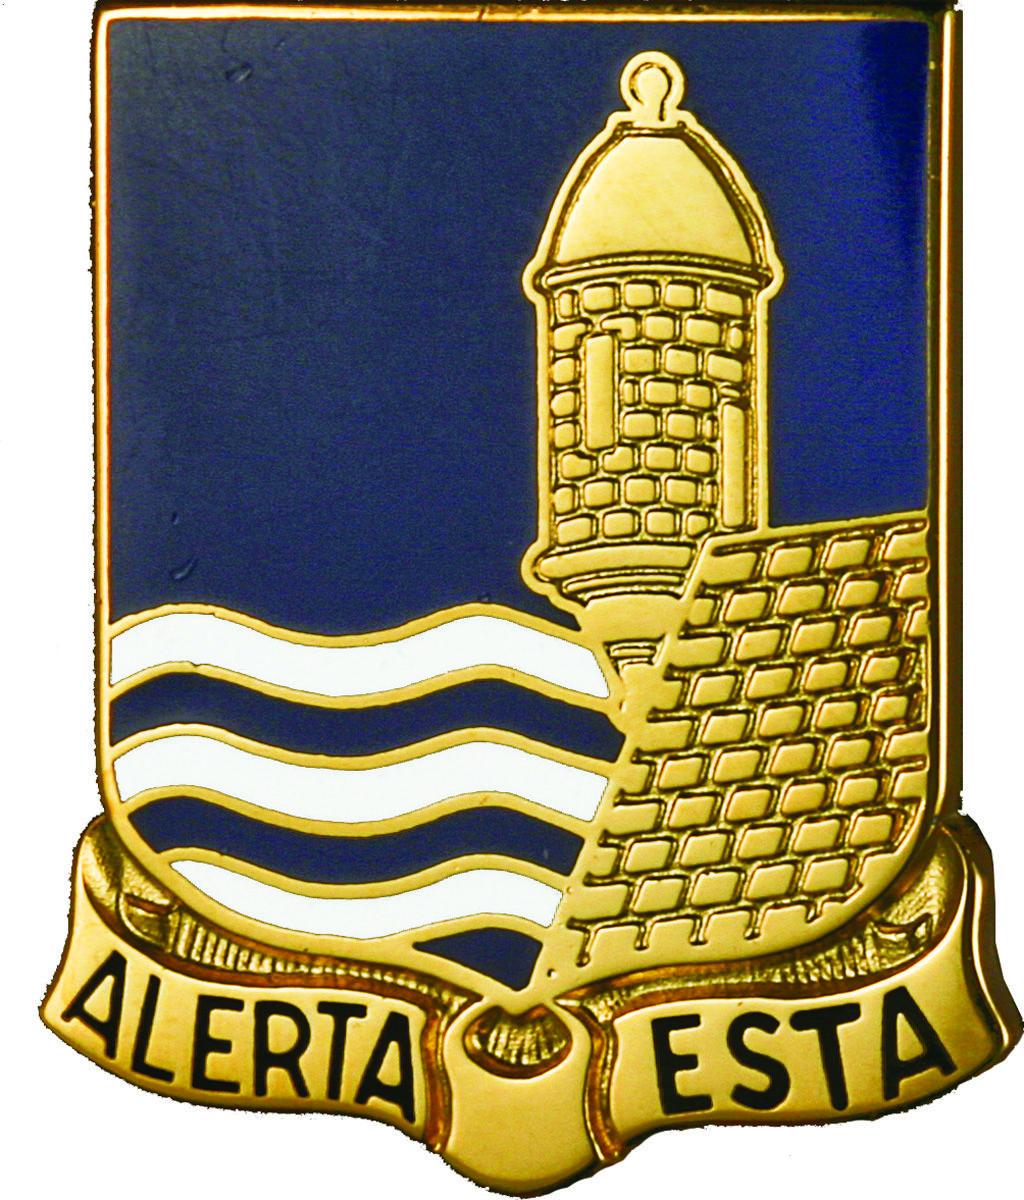 296th Infantry Unit Crest (Alerta Esta)